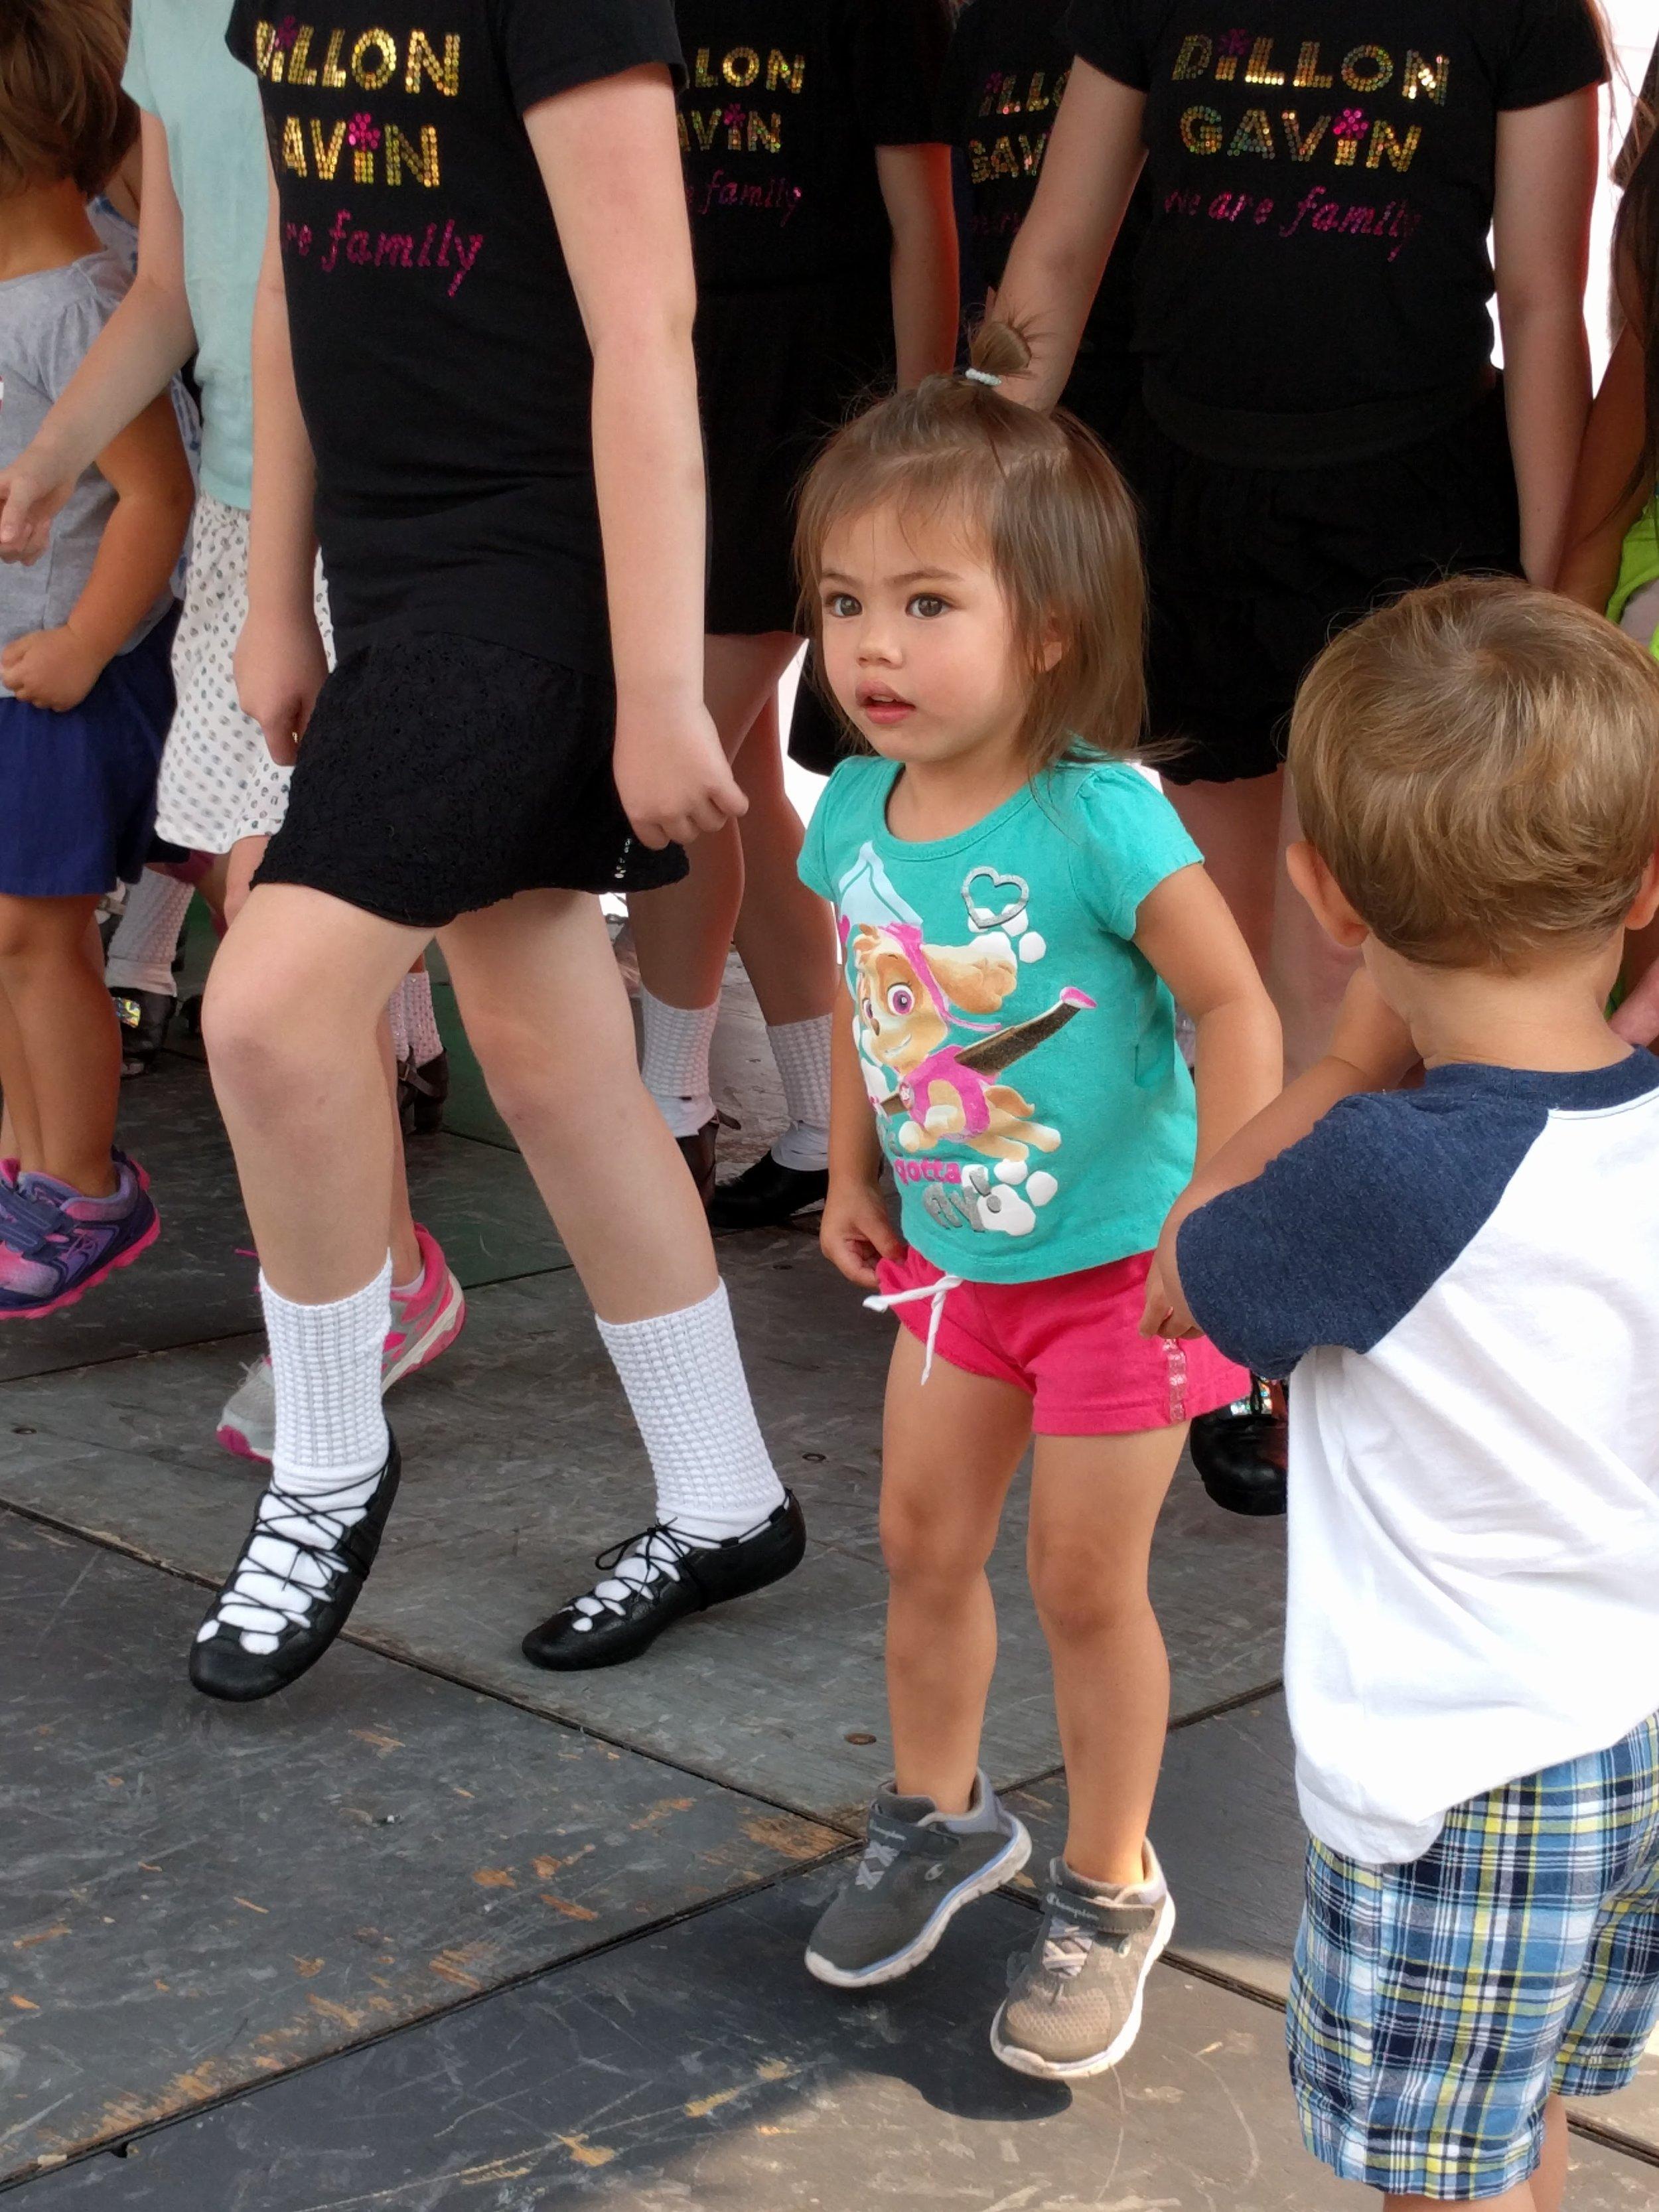 Isla taking in an Irish dance lesson on the stage at Irish Days.